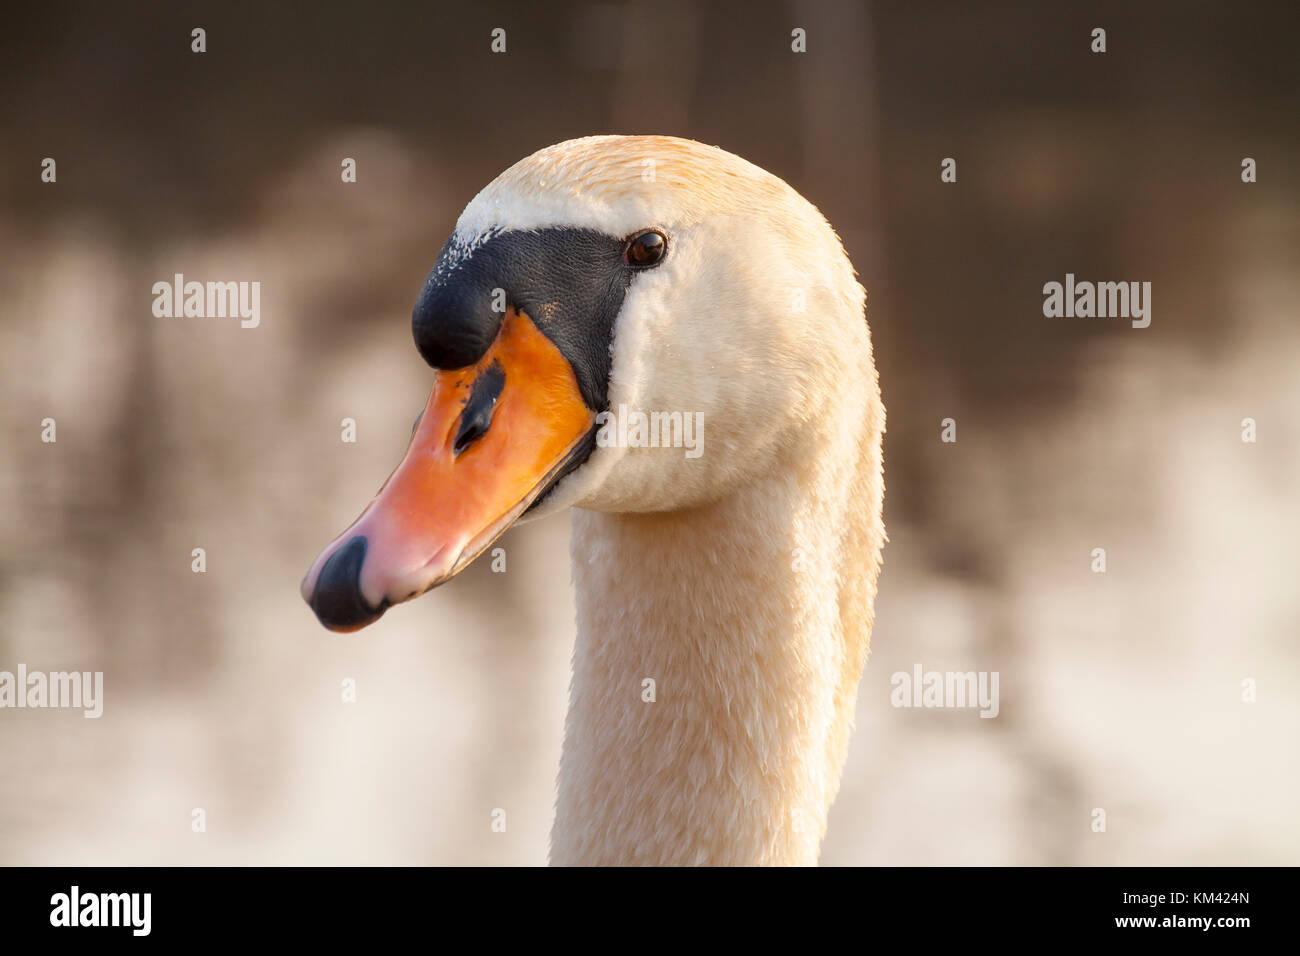 Swan portrait - Stock Image